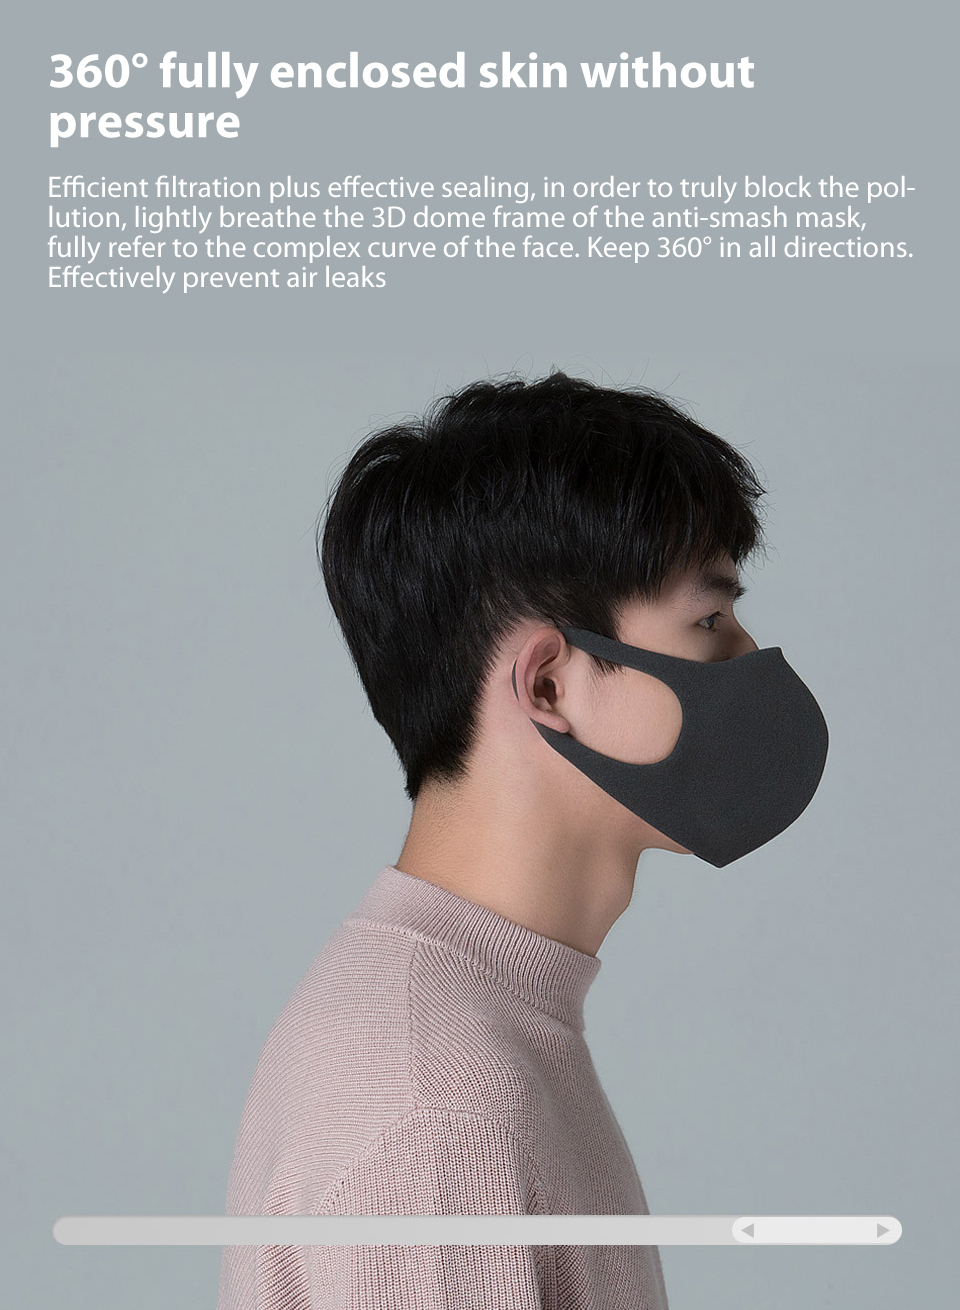 Xiaomi Mijia Smartmi Filter Mask Block 97% PM 2.5 with Ventilating Valve Long-lasting TPU Material 3 PCS Filter Mask Smart Home (11)